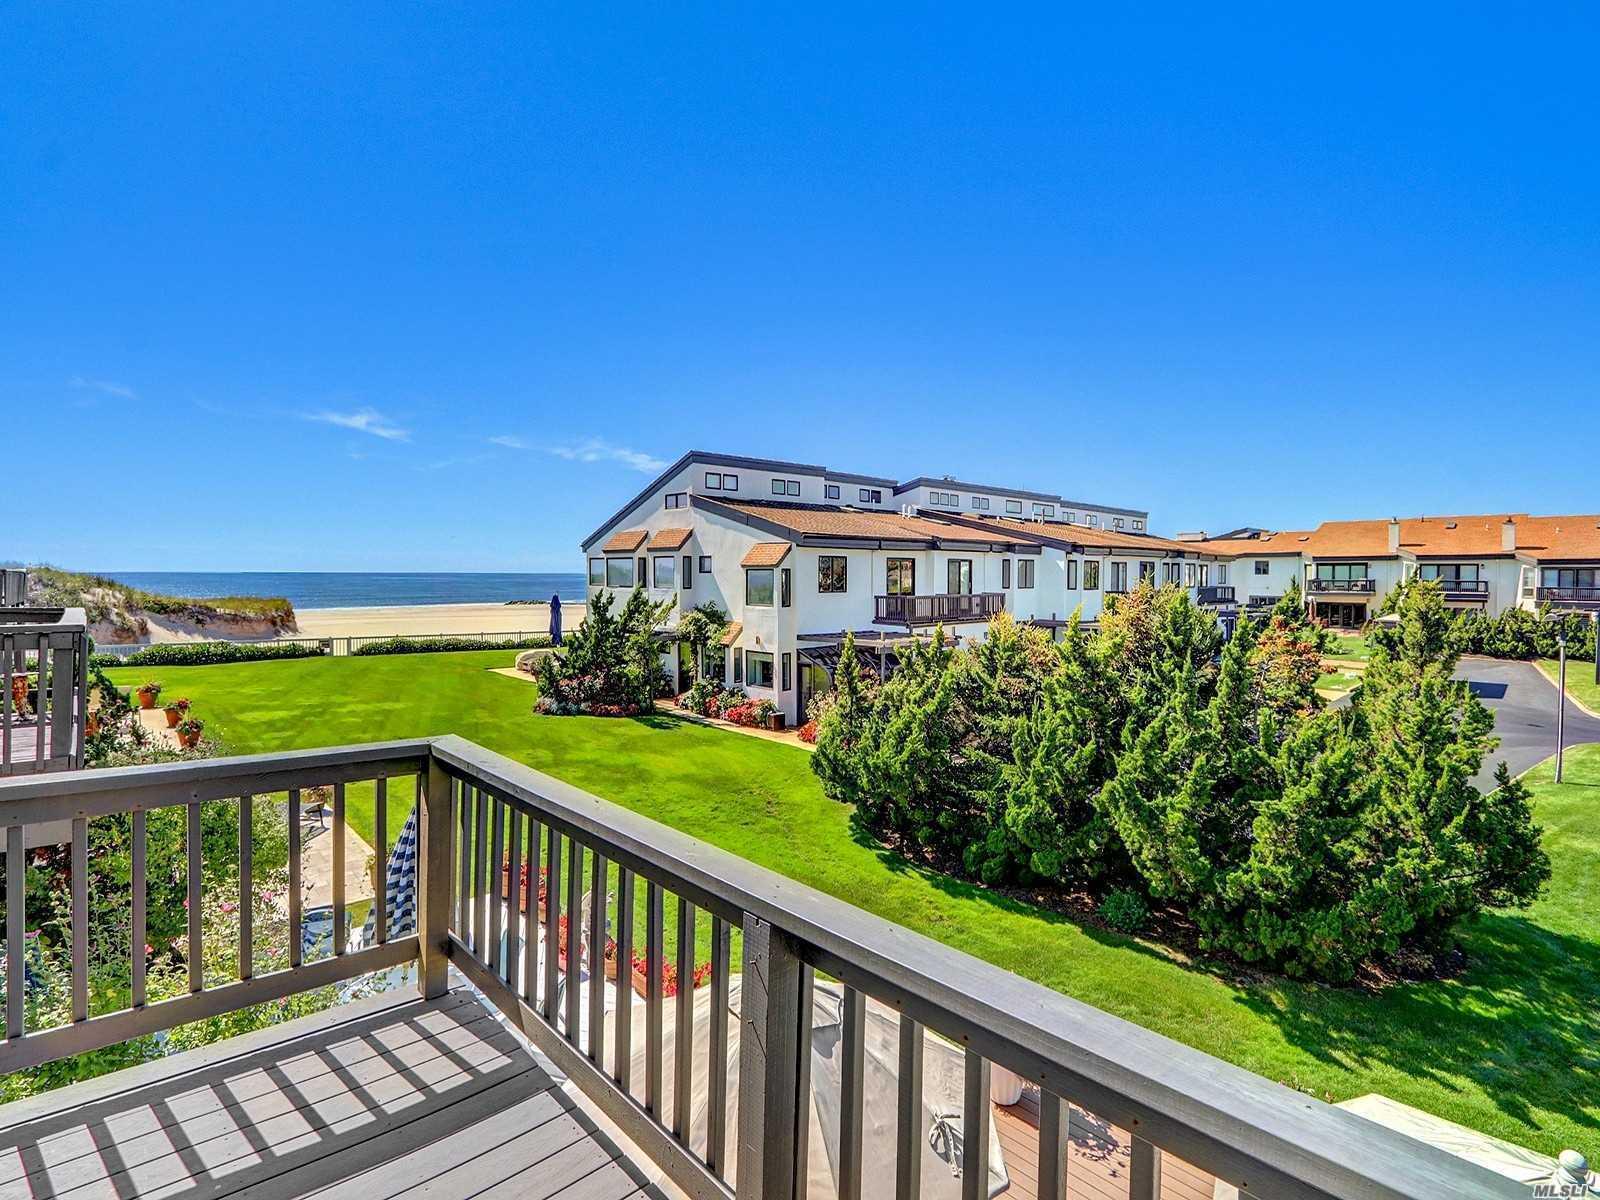 Property for sale at 1621 Ocean Boulevard, Atlantic Beach NY 11509, Atlantic Beach,  New York 11509